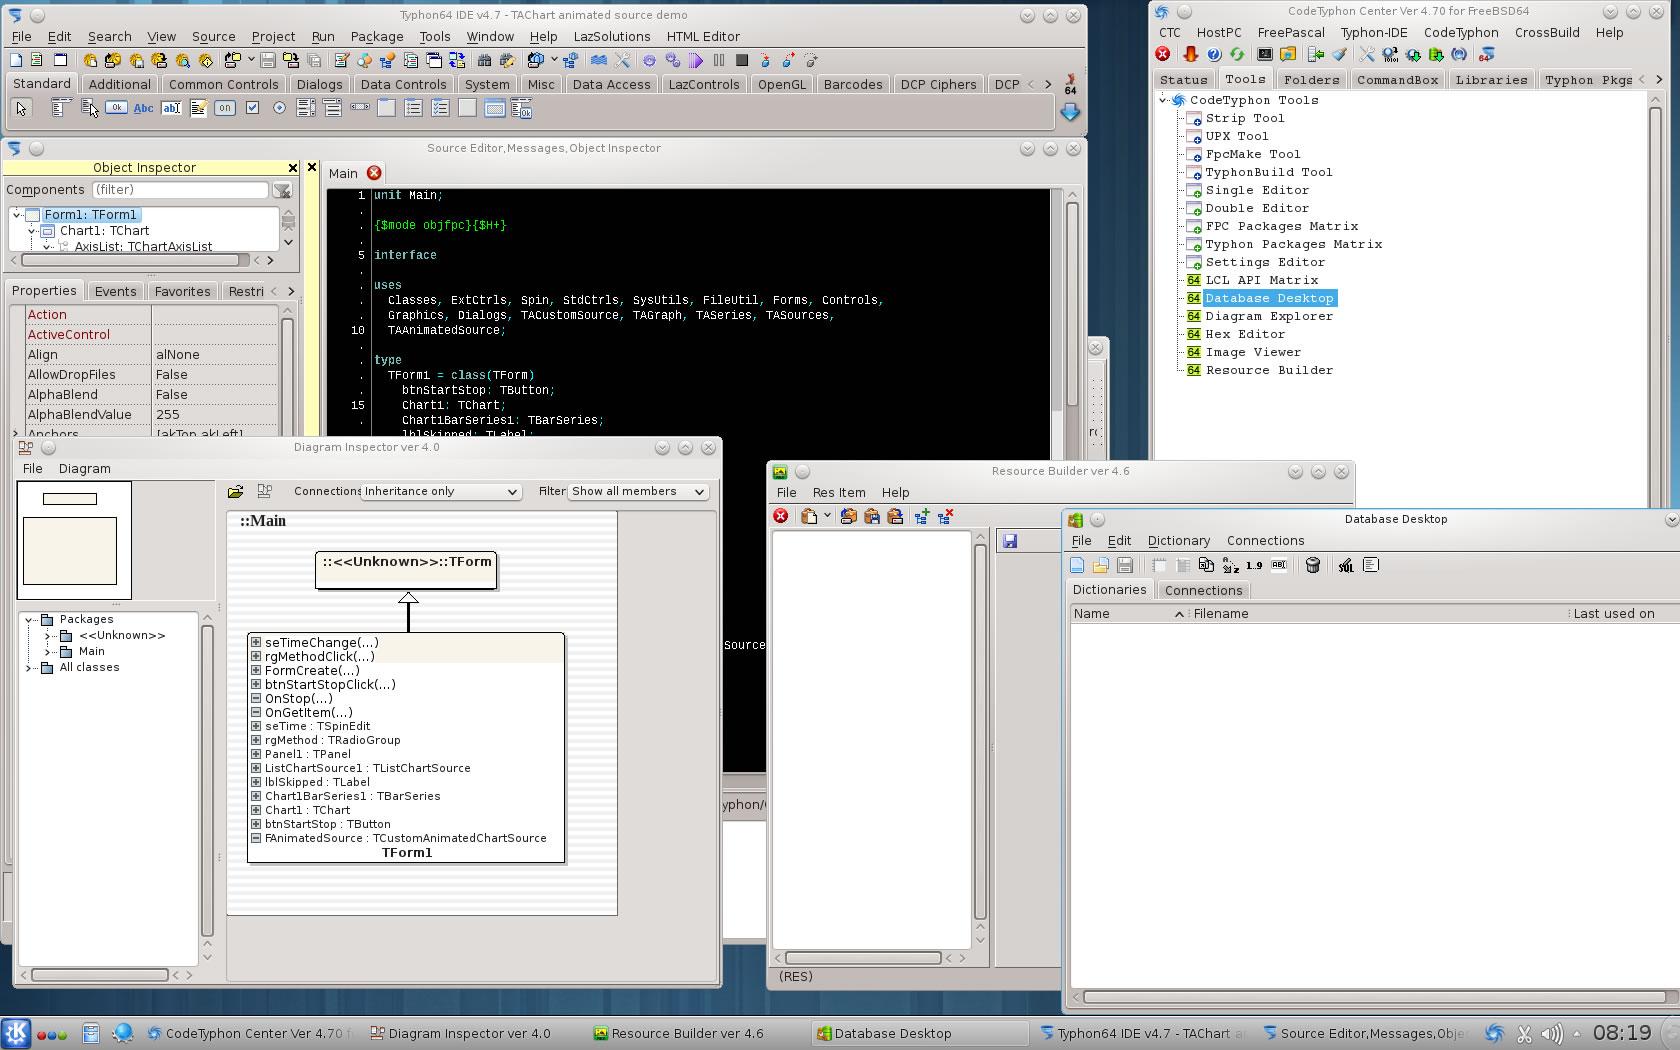 FreeBSD64-37.jpg